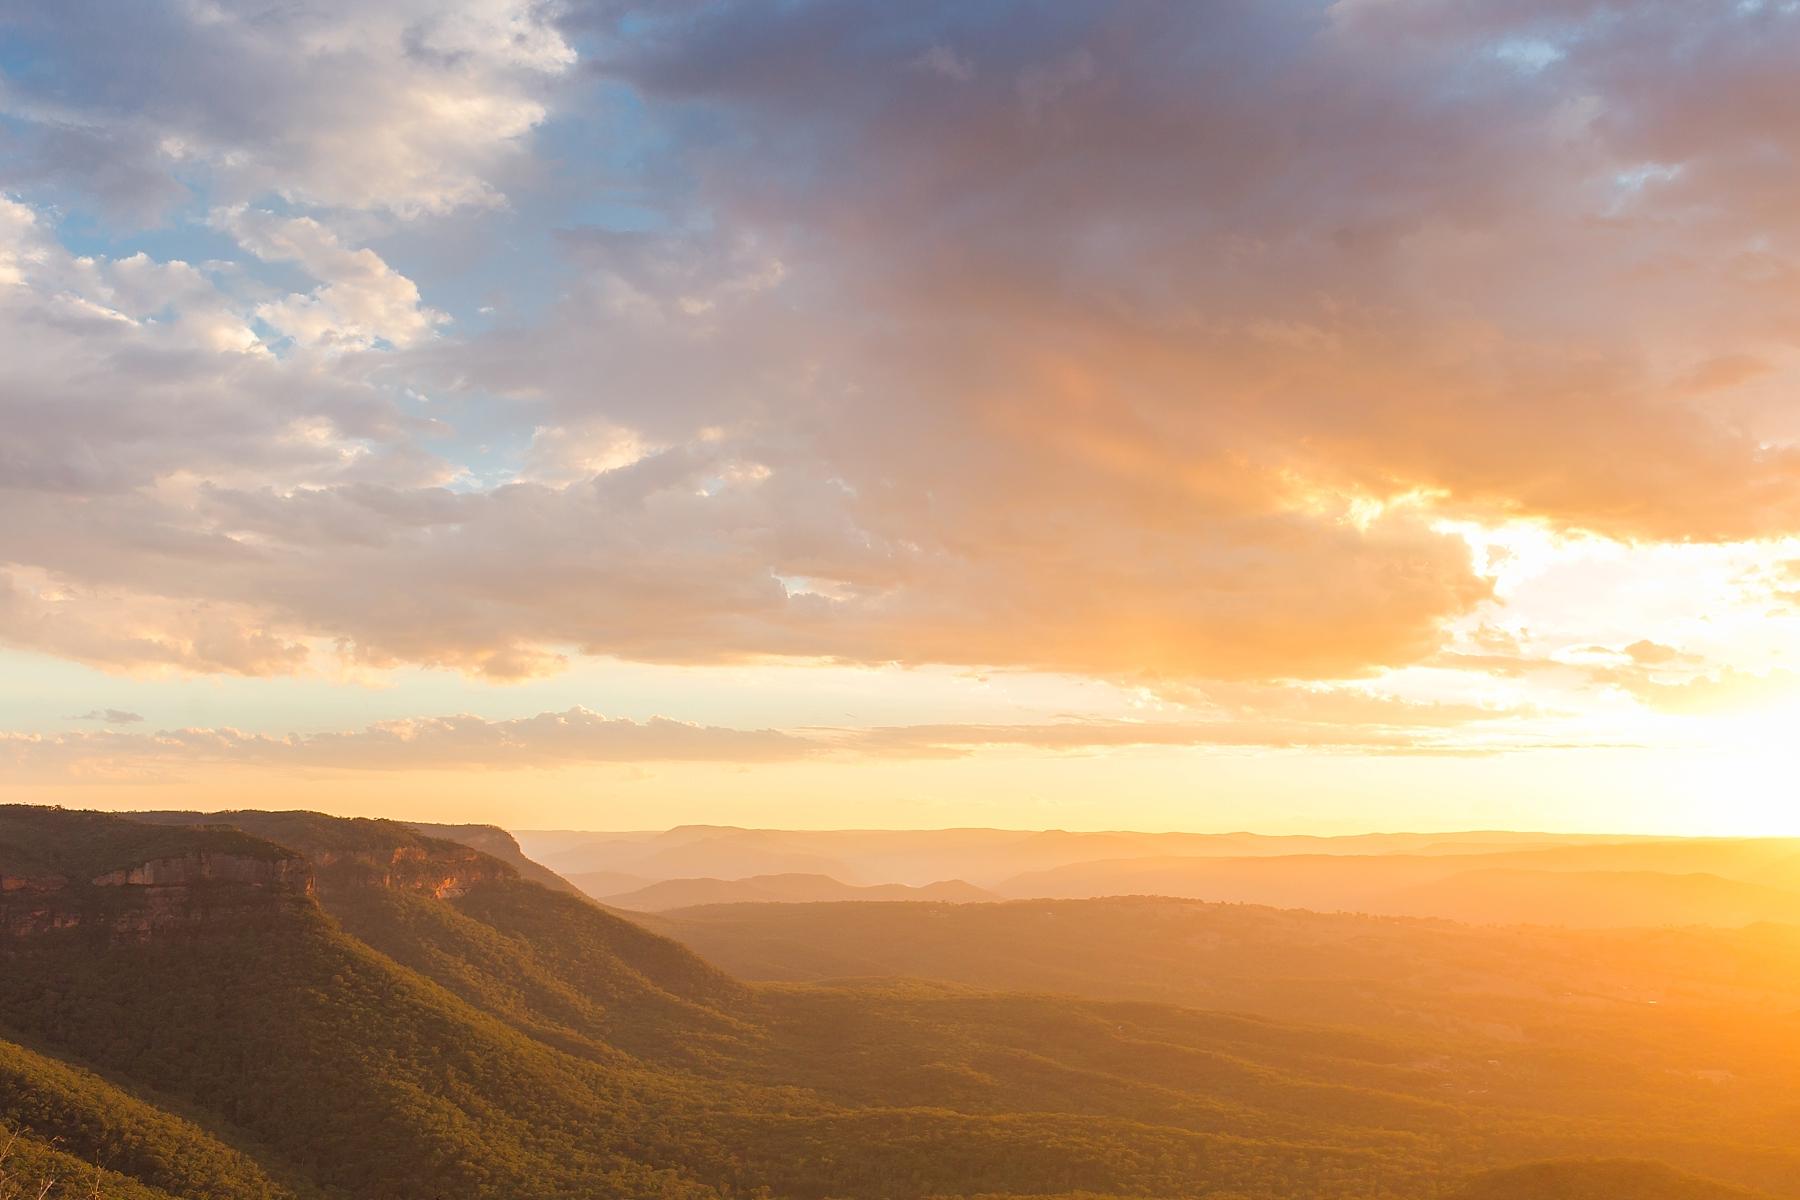 blue-mountains-australia-scenery_0140.jpg